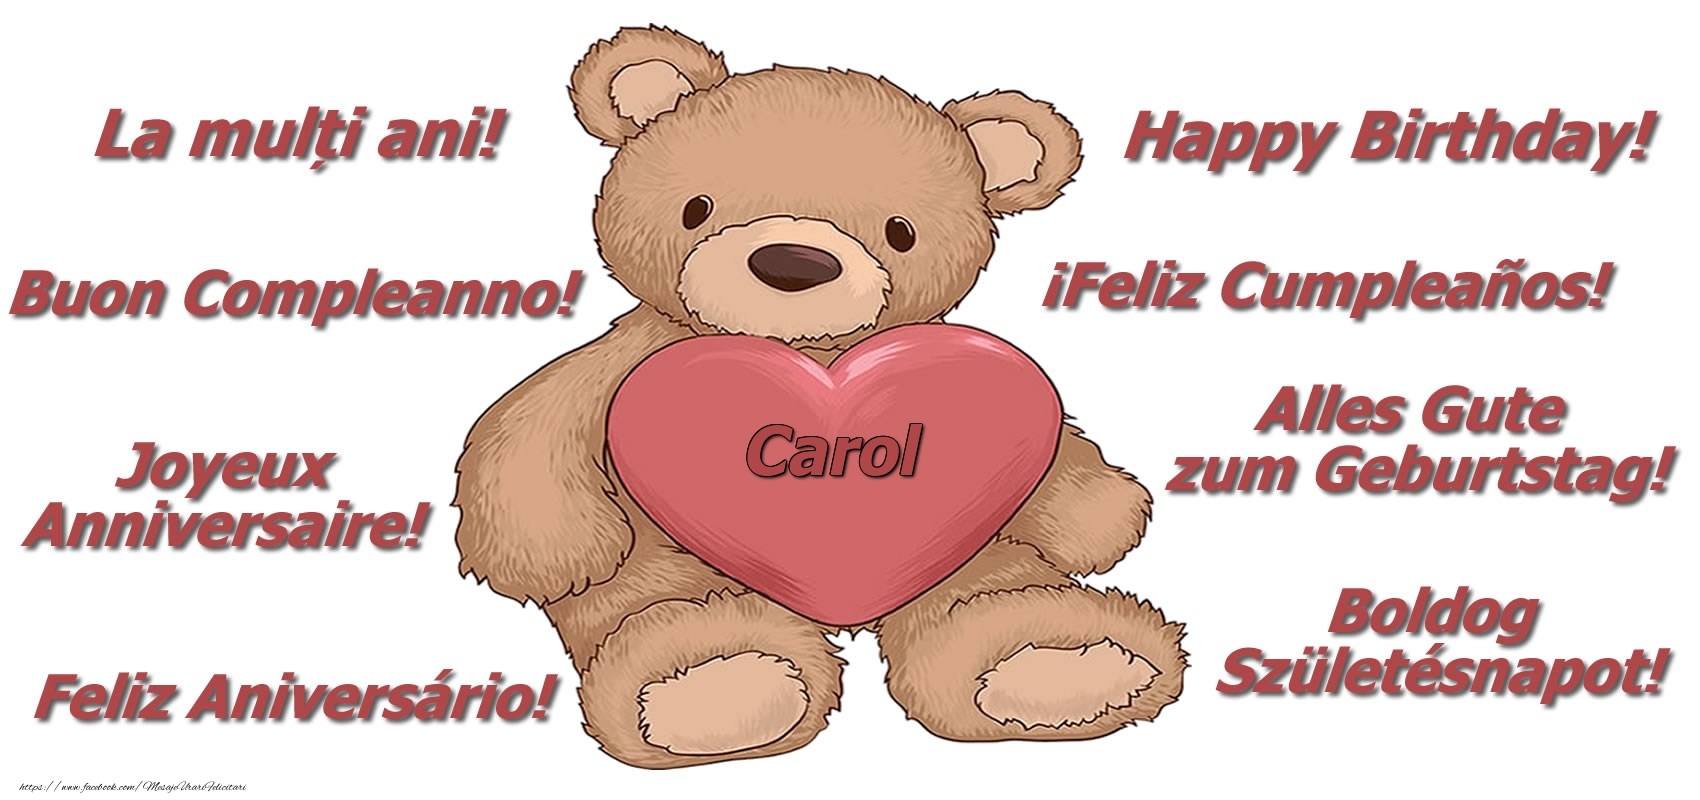 Felicitari de zi de nastere - La multi ani Carol! - Ursulet